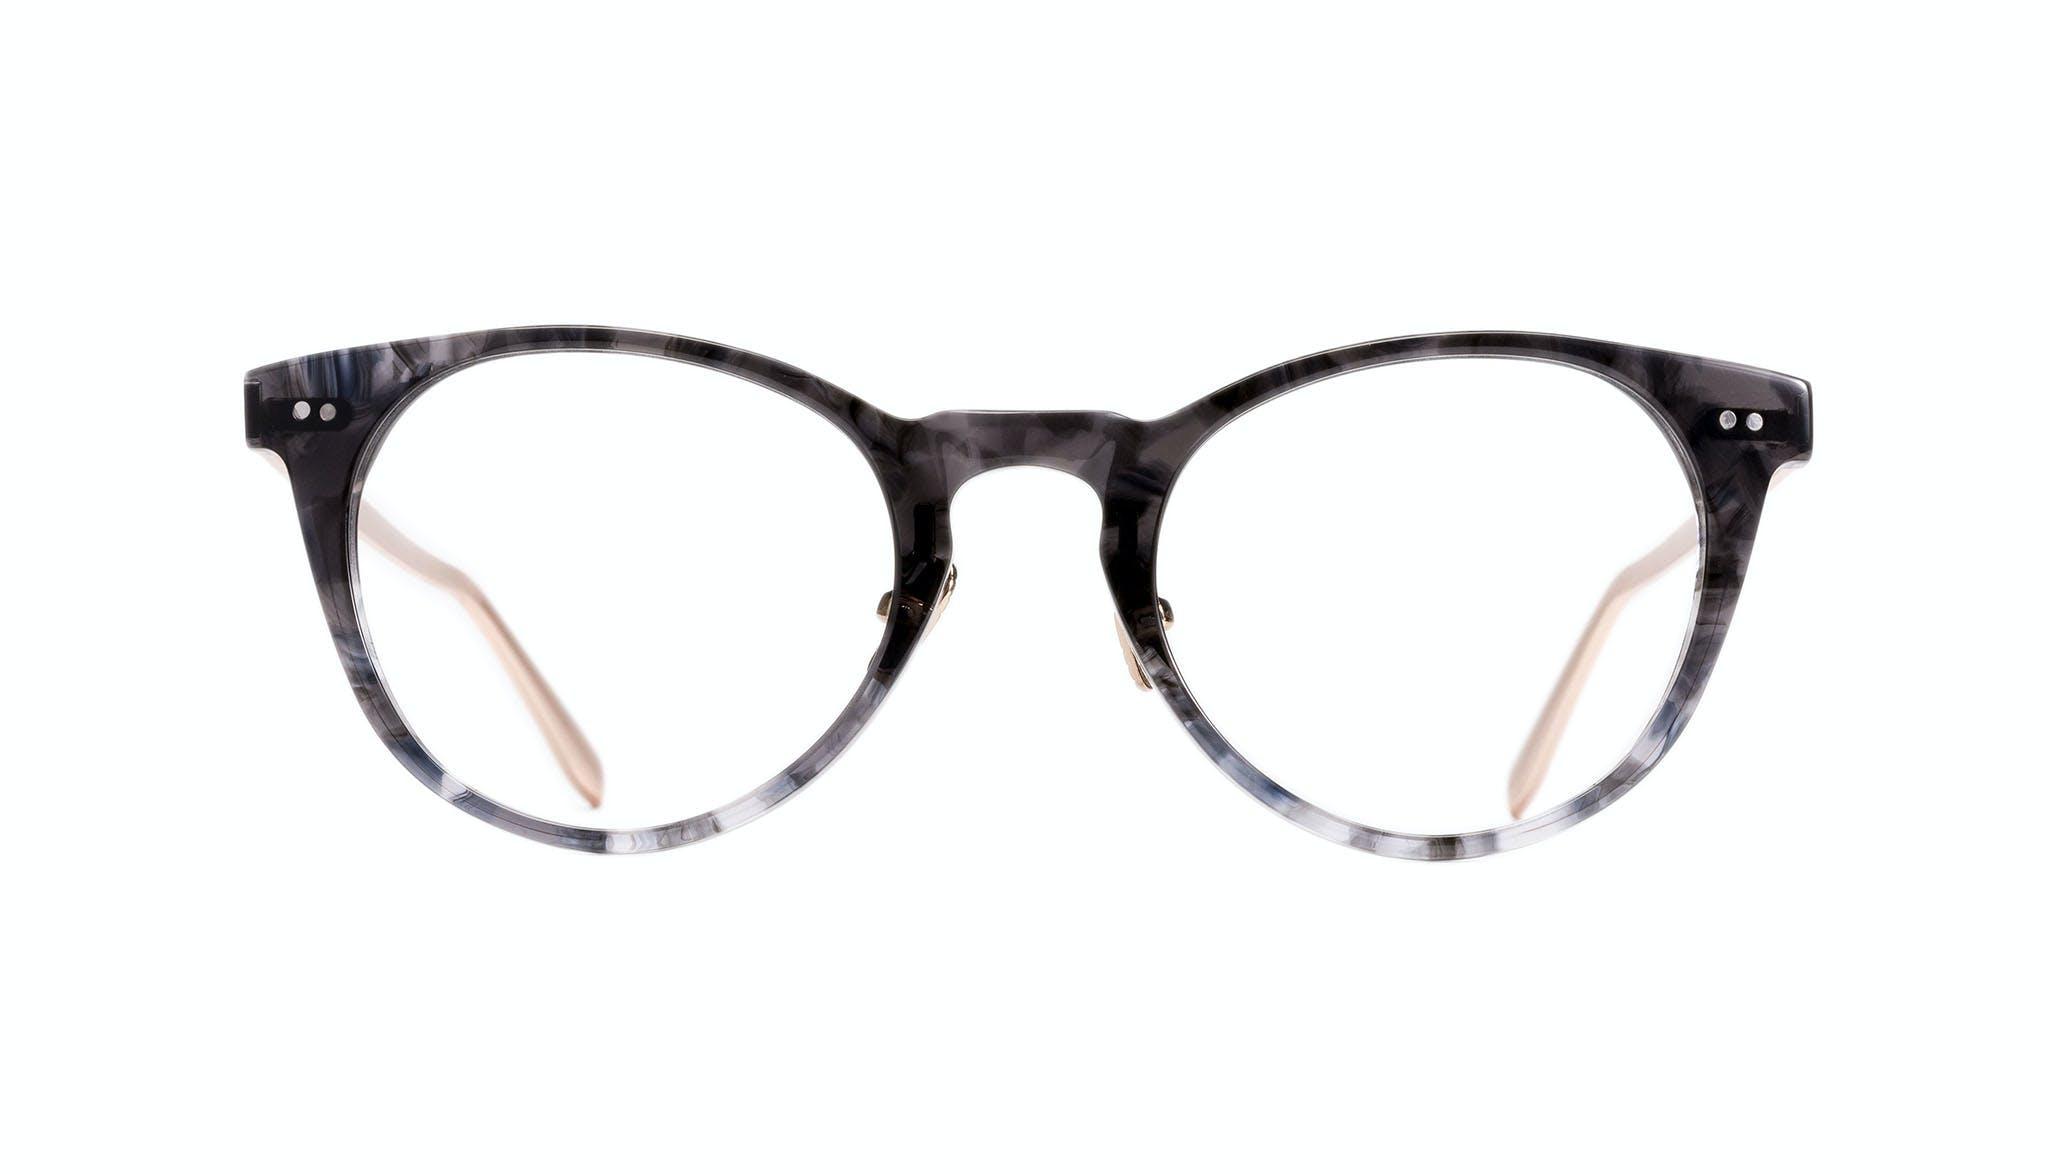 Affordable Fashion Glasses Round Eyeglasses Women Luv Dark Night Front